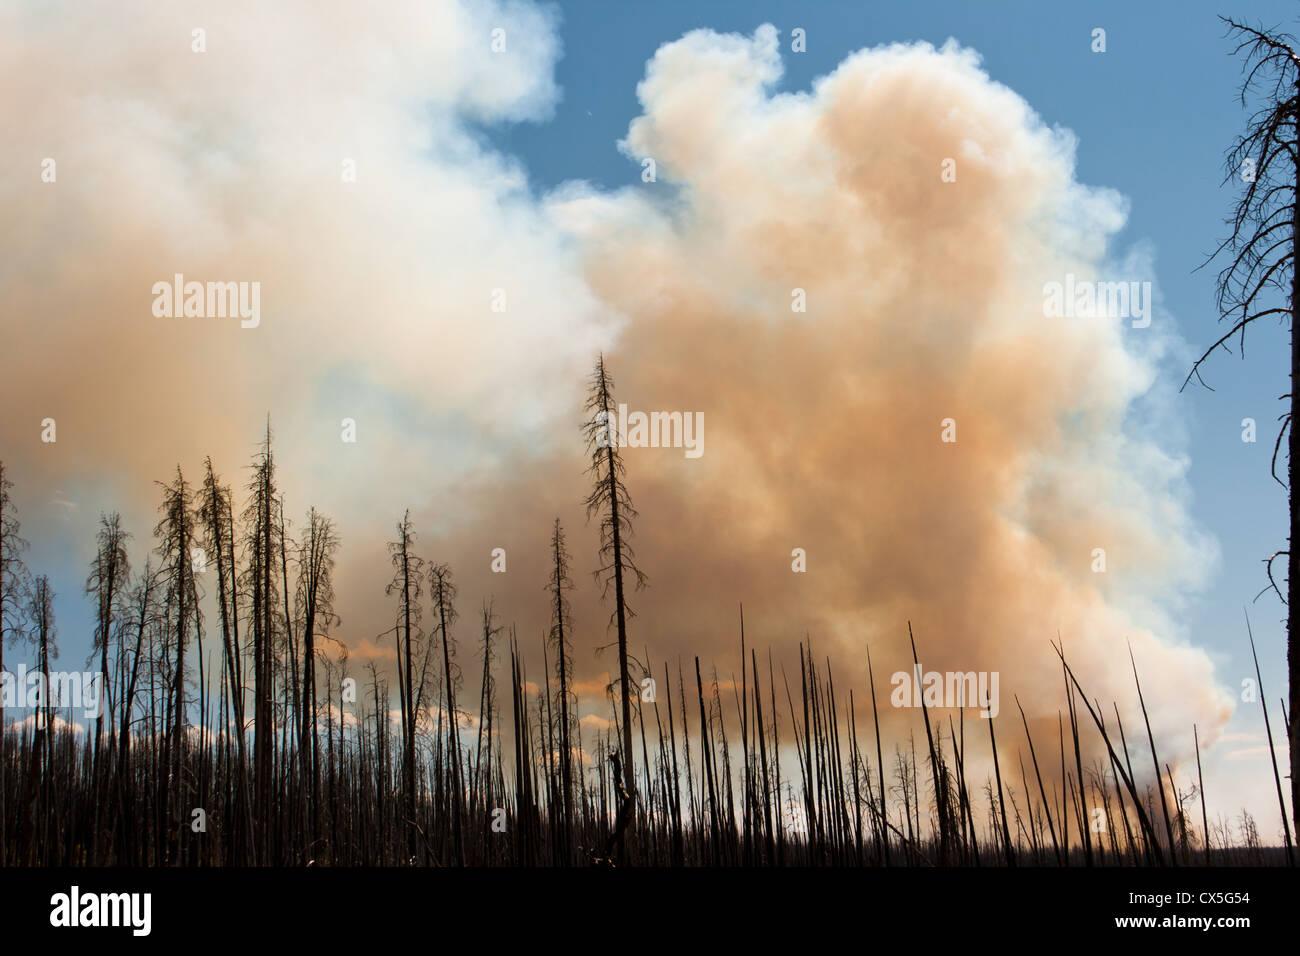 Yellowstone Fire Summer 2011 - Stock Image